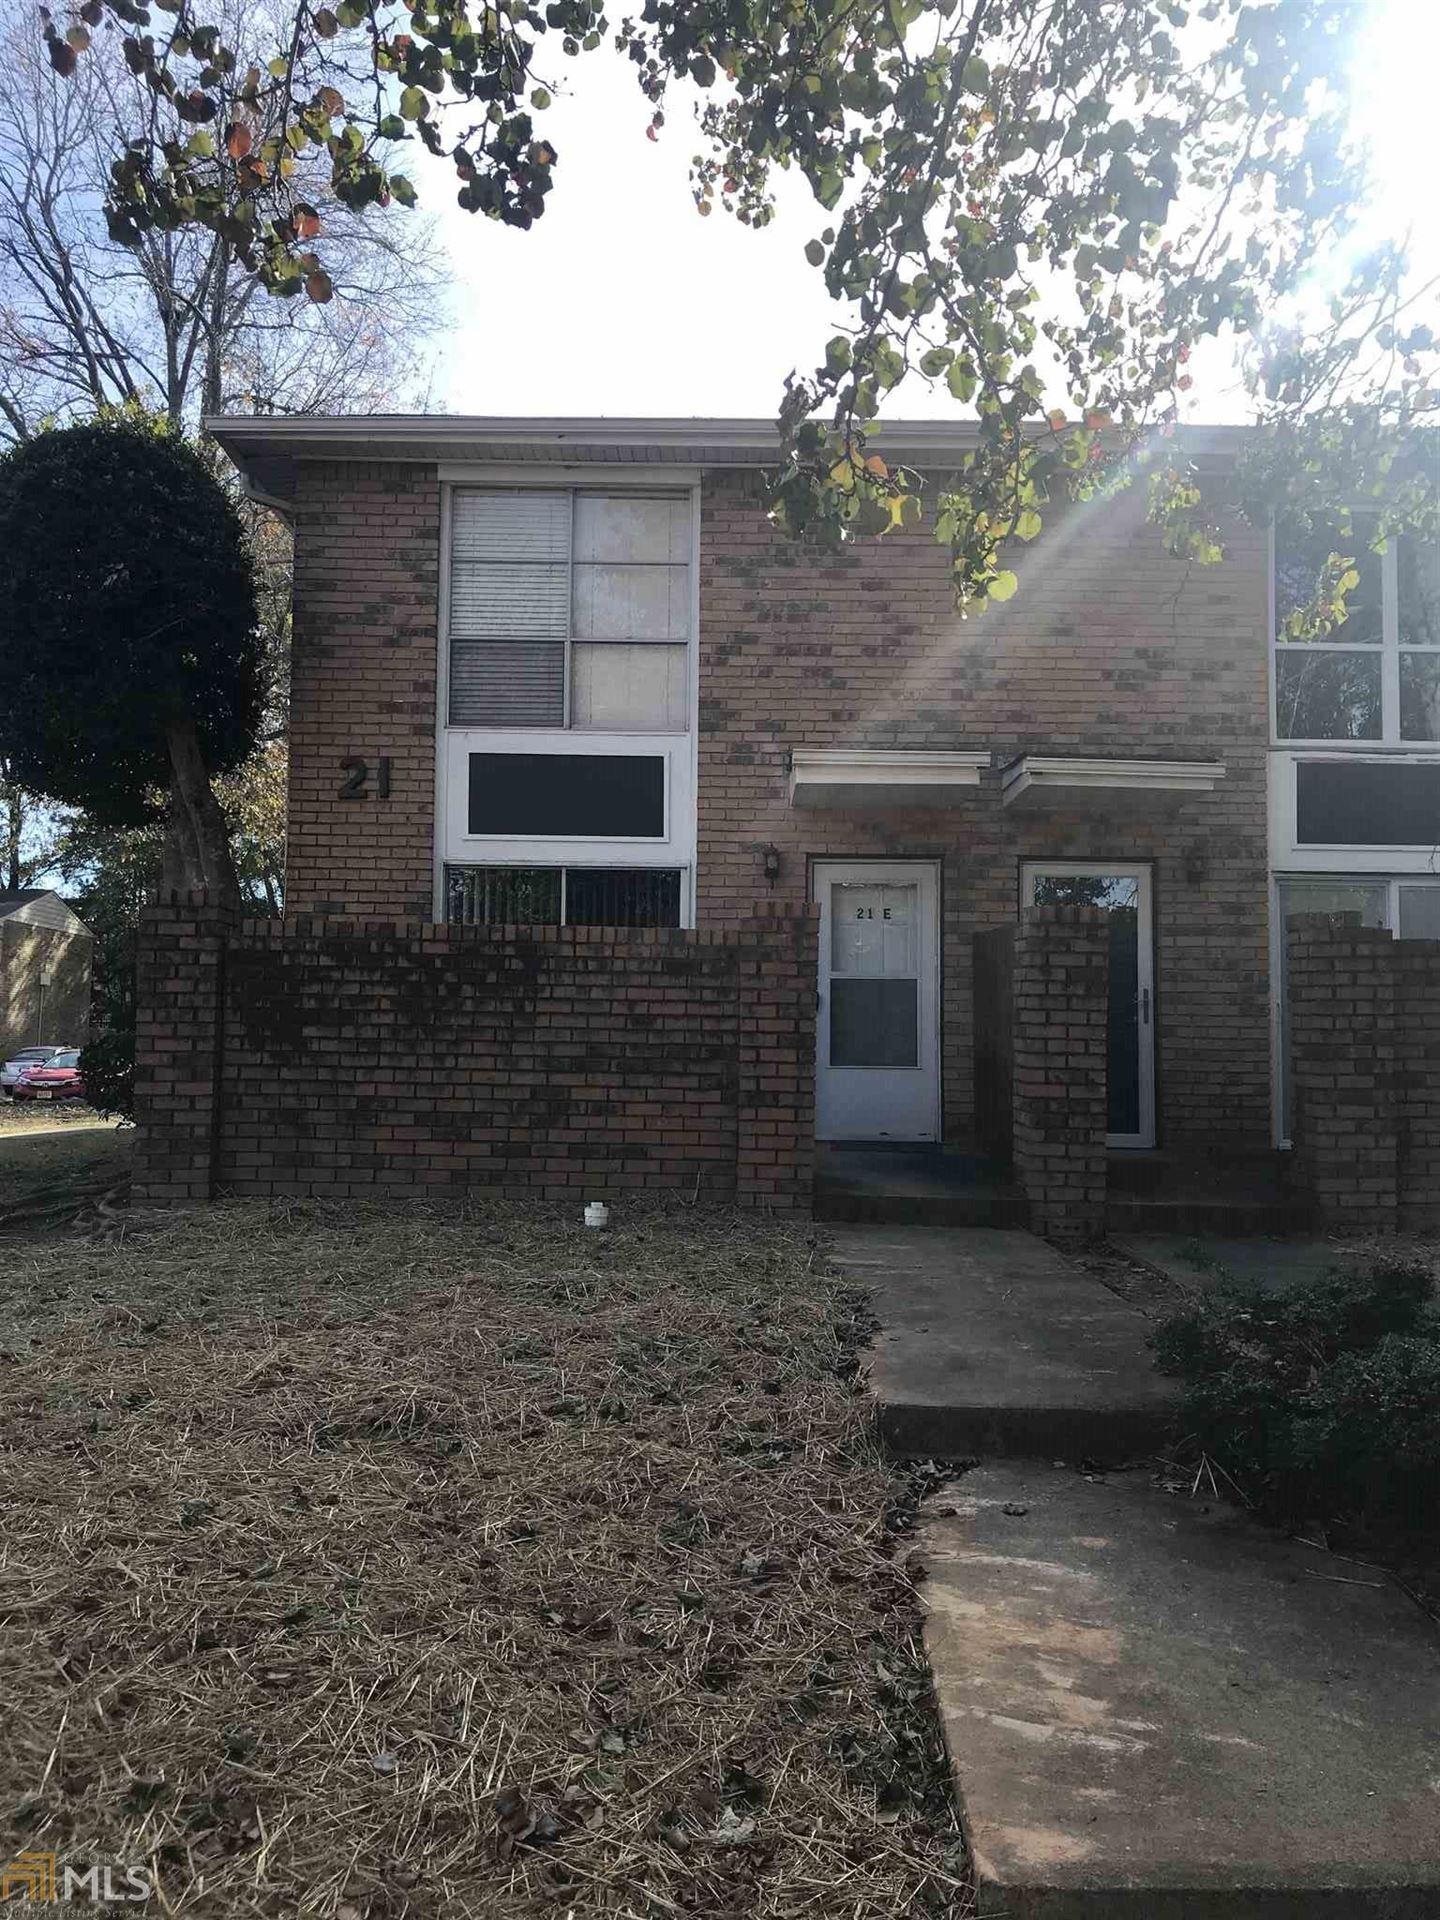 4701 Flat Shoals Rd, Union City, GA 30291 - MLS#: 8897320